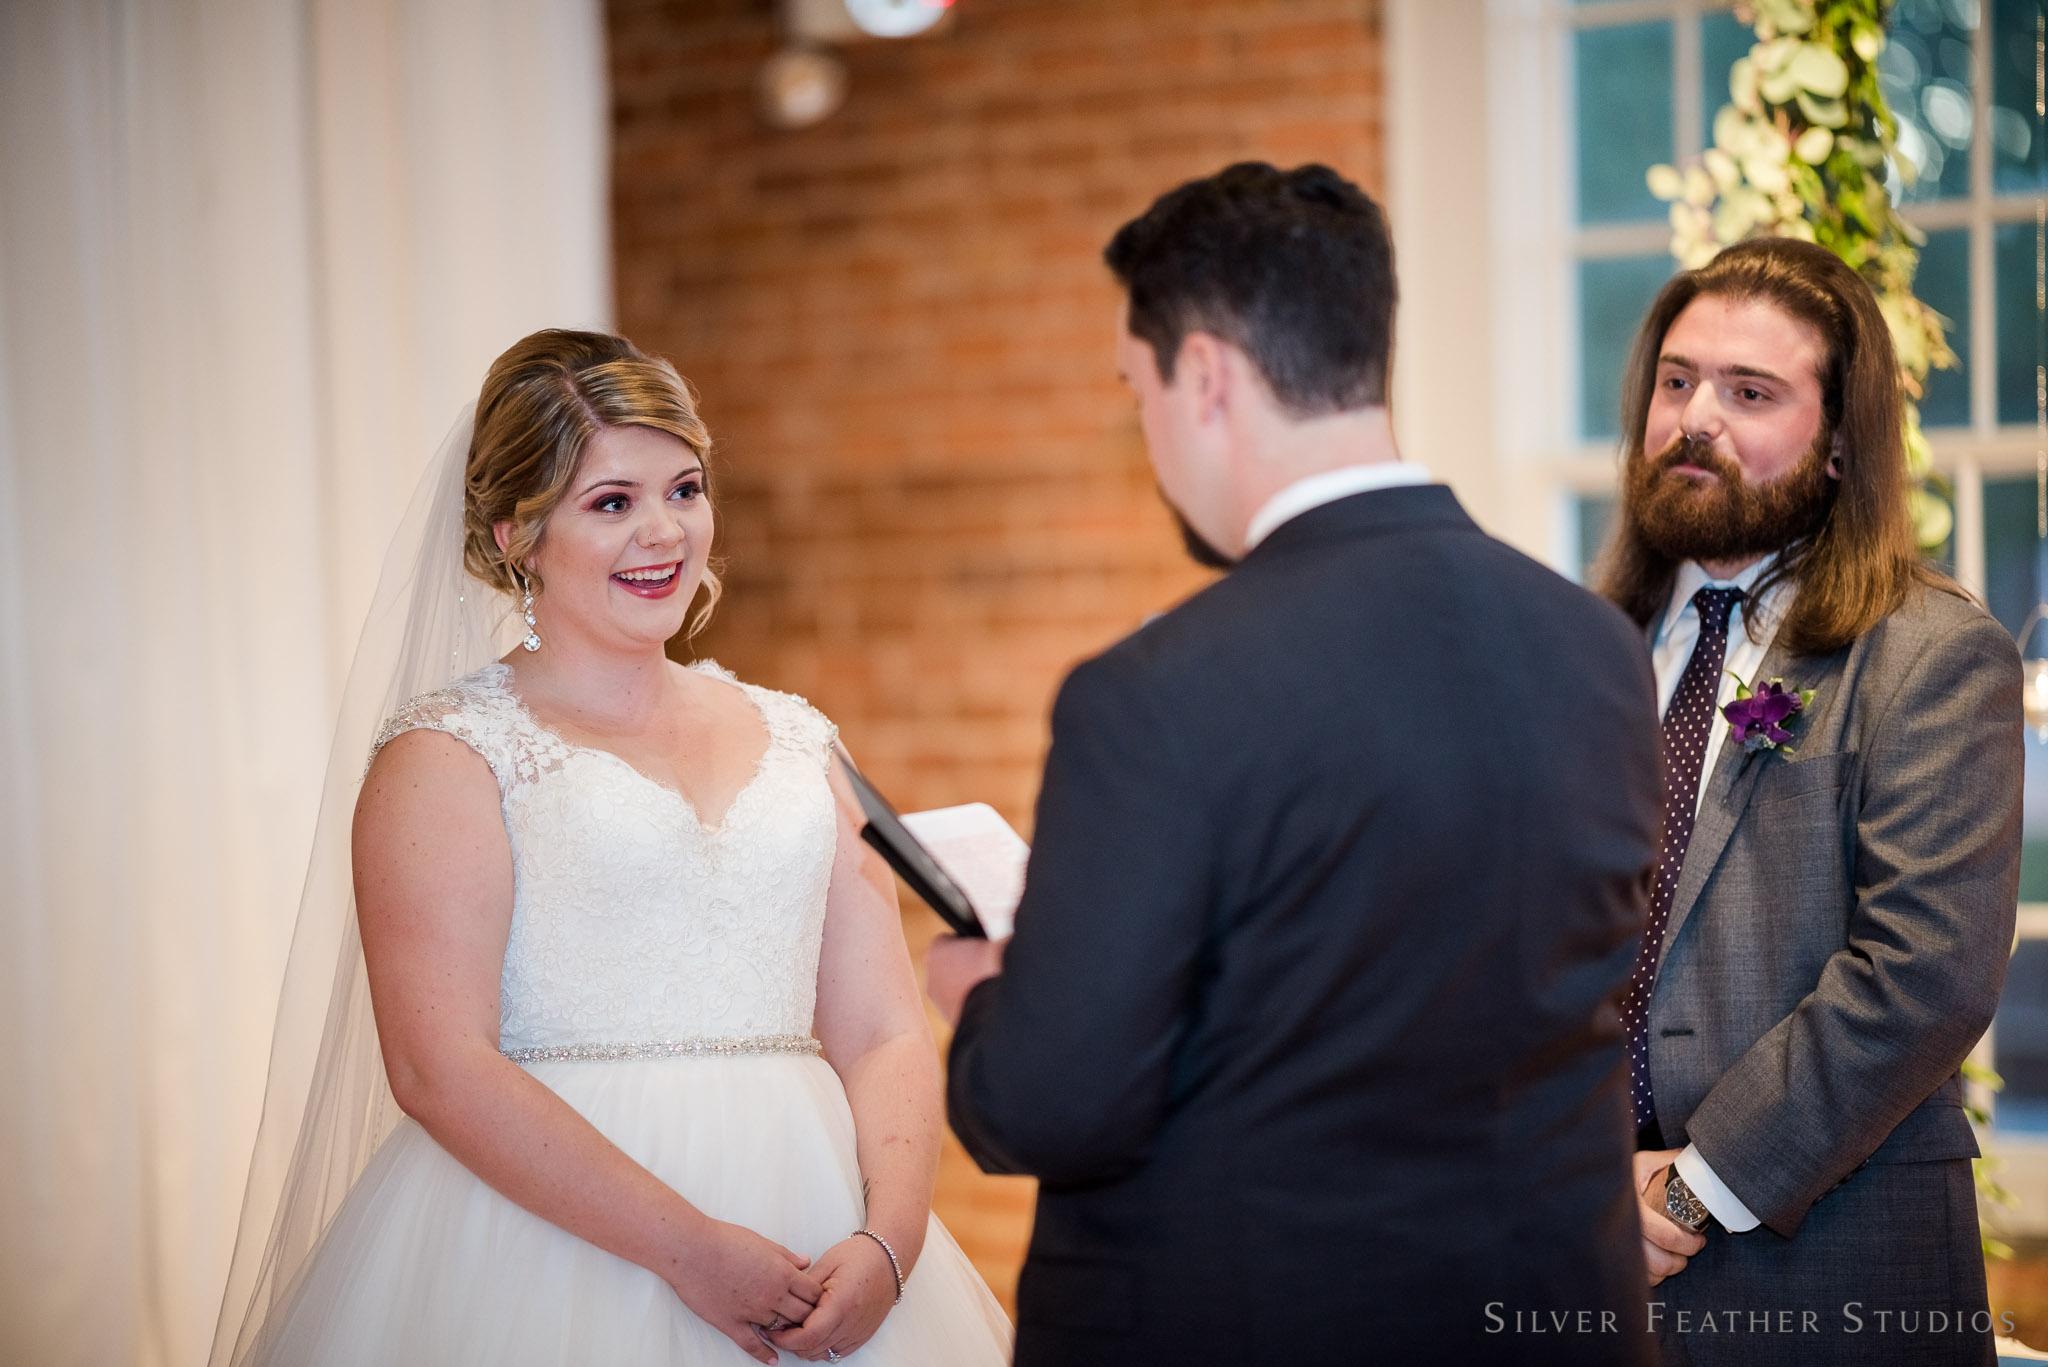 cottom-room-wedding-photography-033.jpg